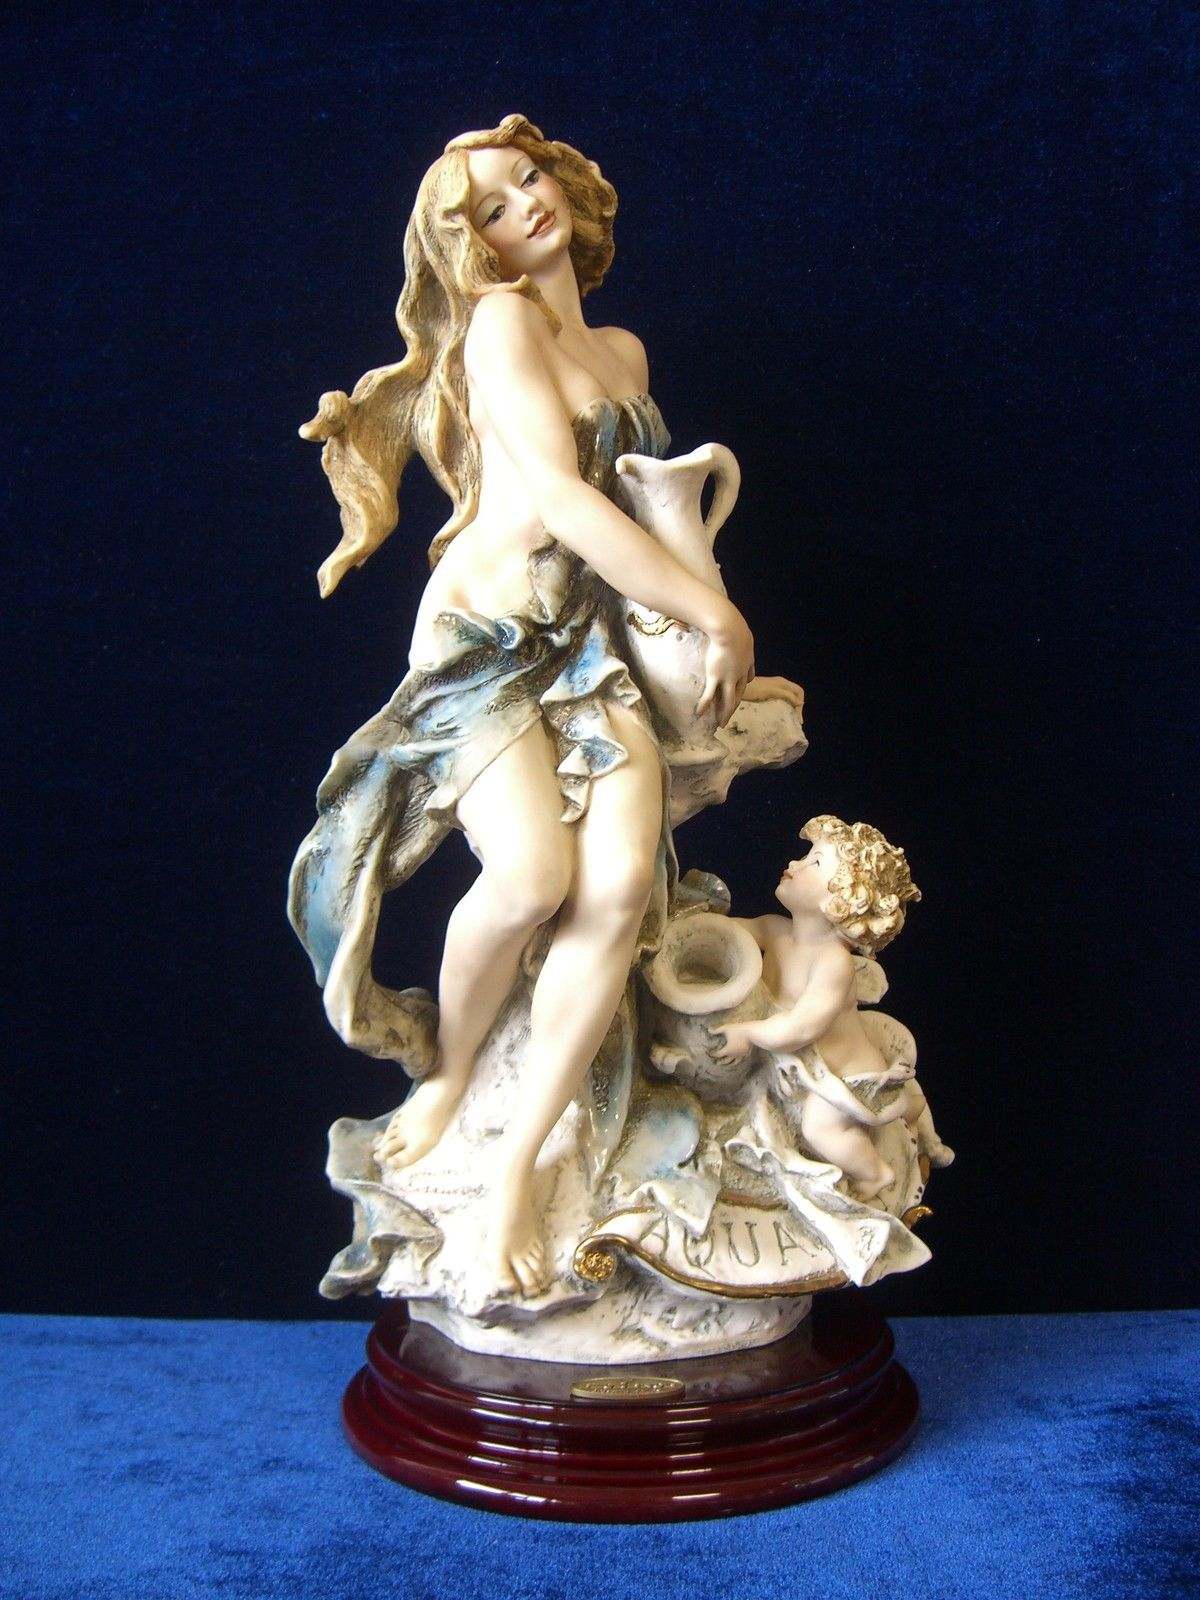 How much Giuseppe Armani figurines worth?